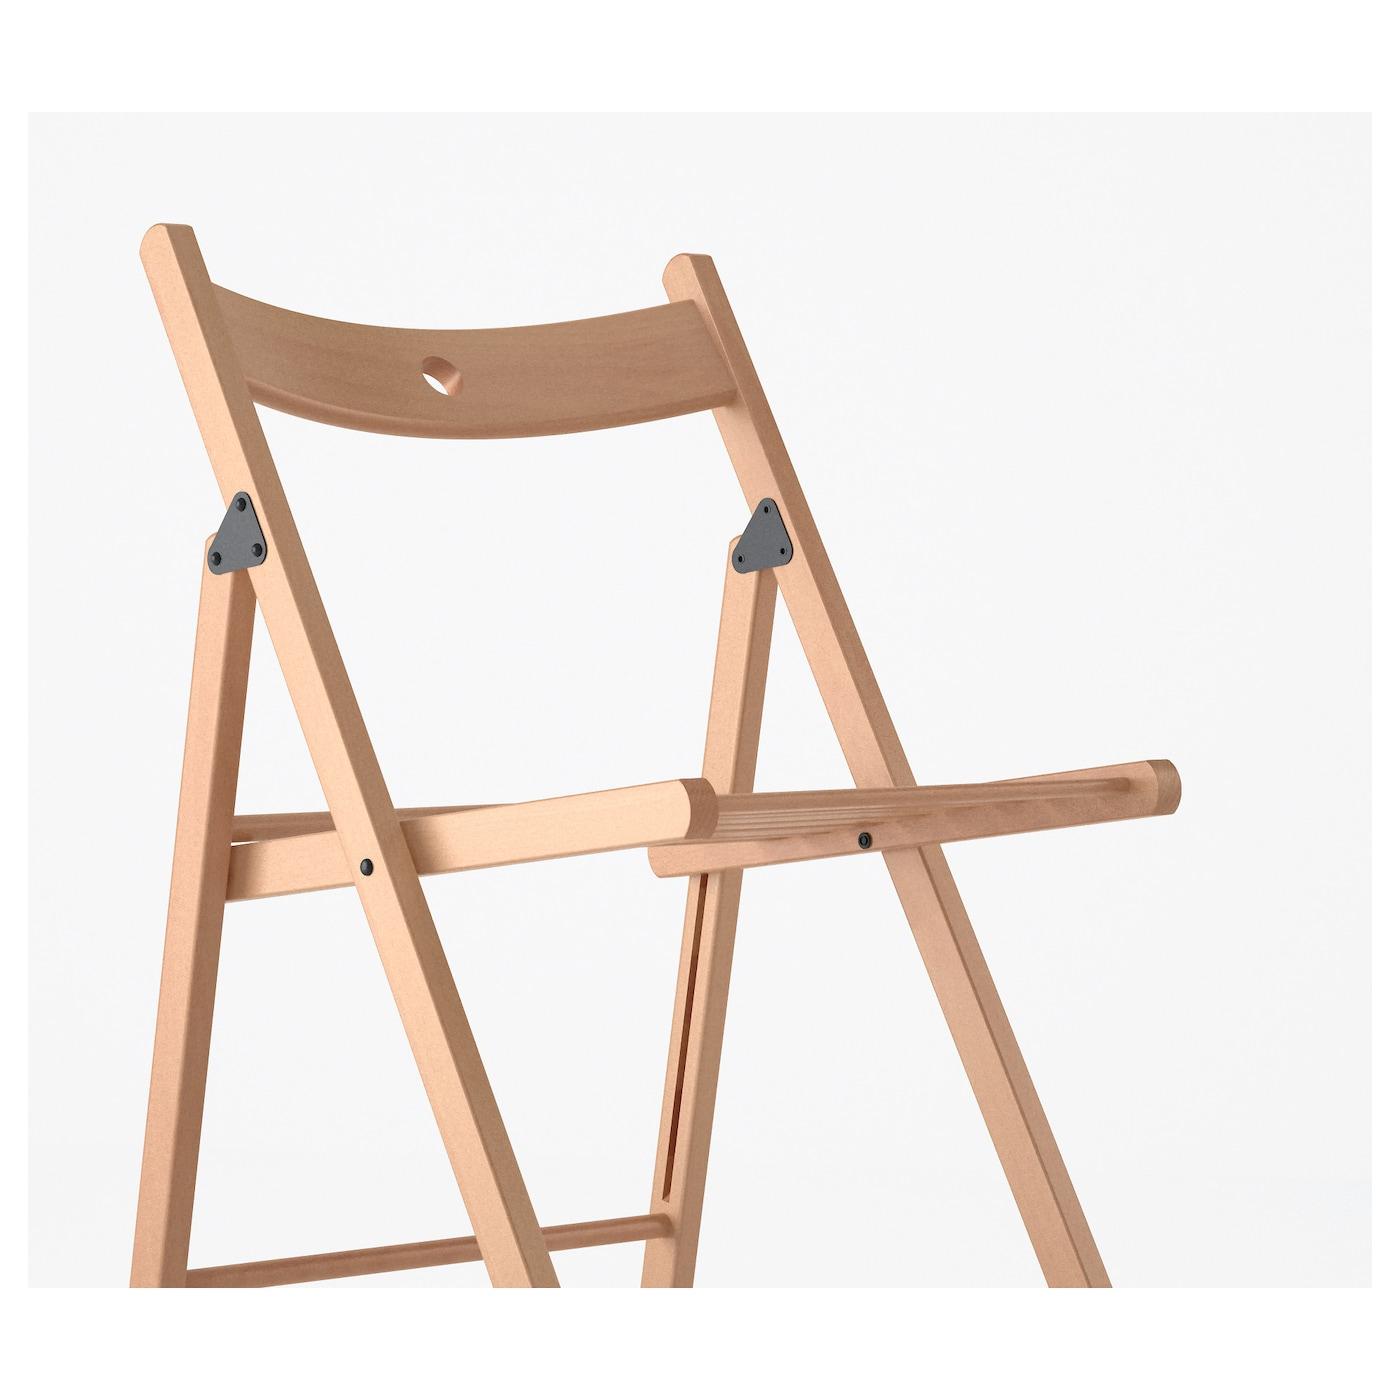 terje chaise pliante h tre ikea. Black Bedroom Furniture Sets. Home Design Ideas